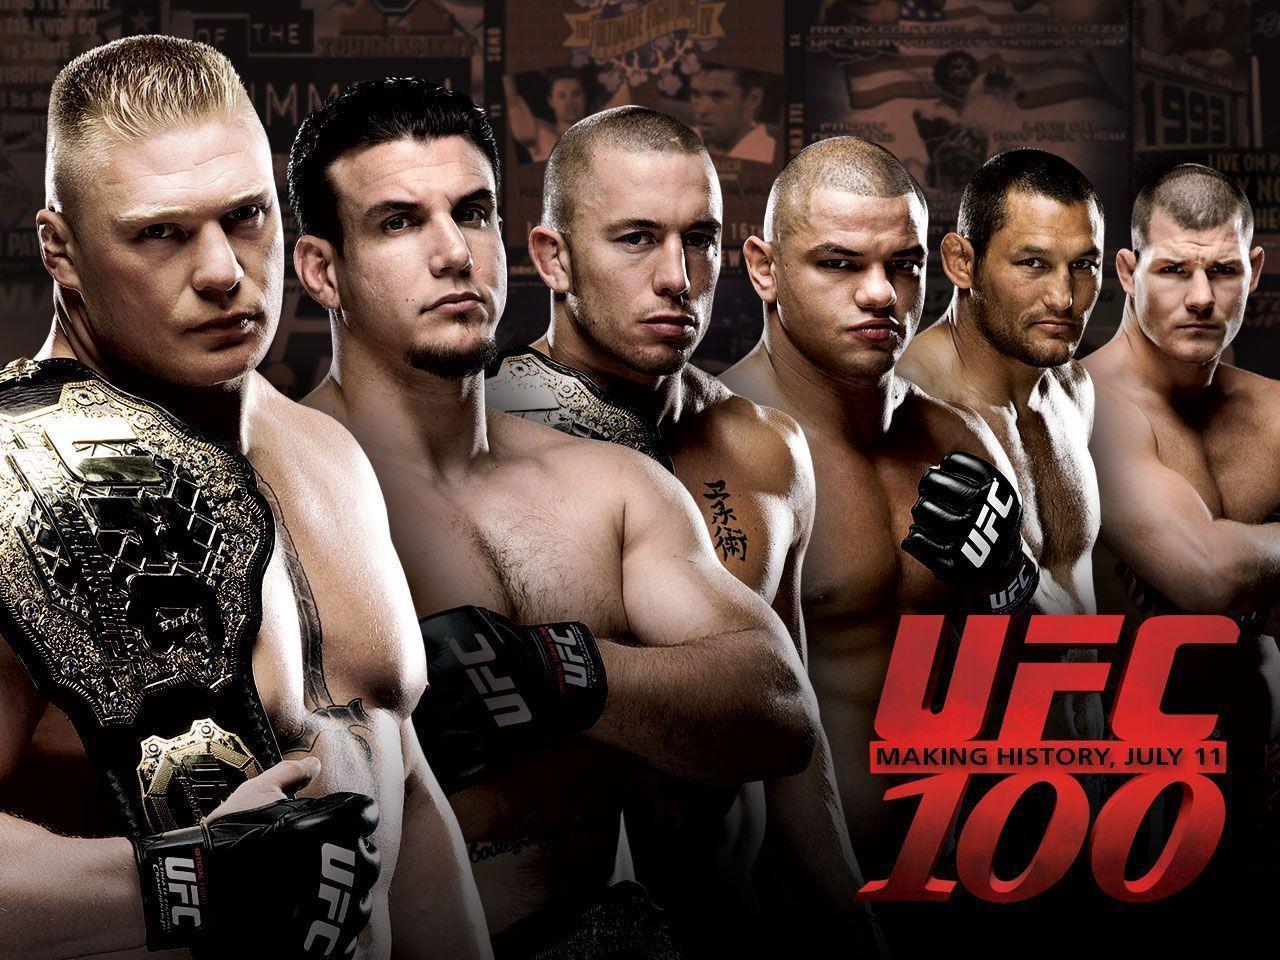 UFC Wallpapers - Wallpaper Cave